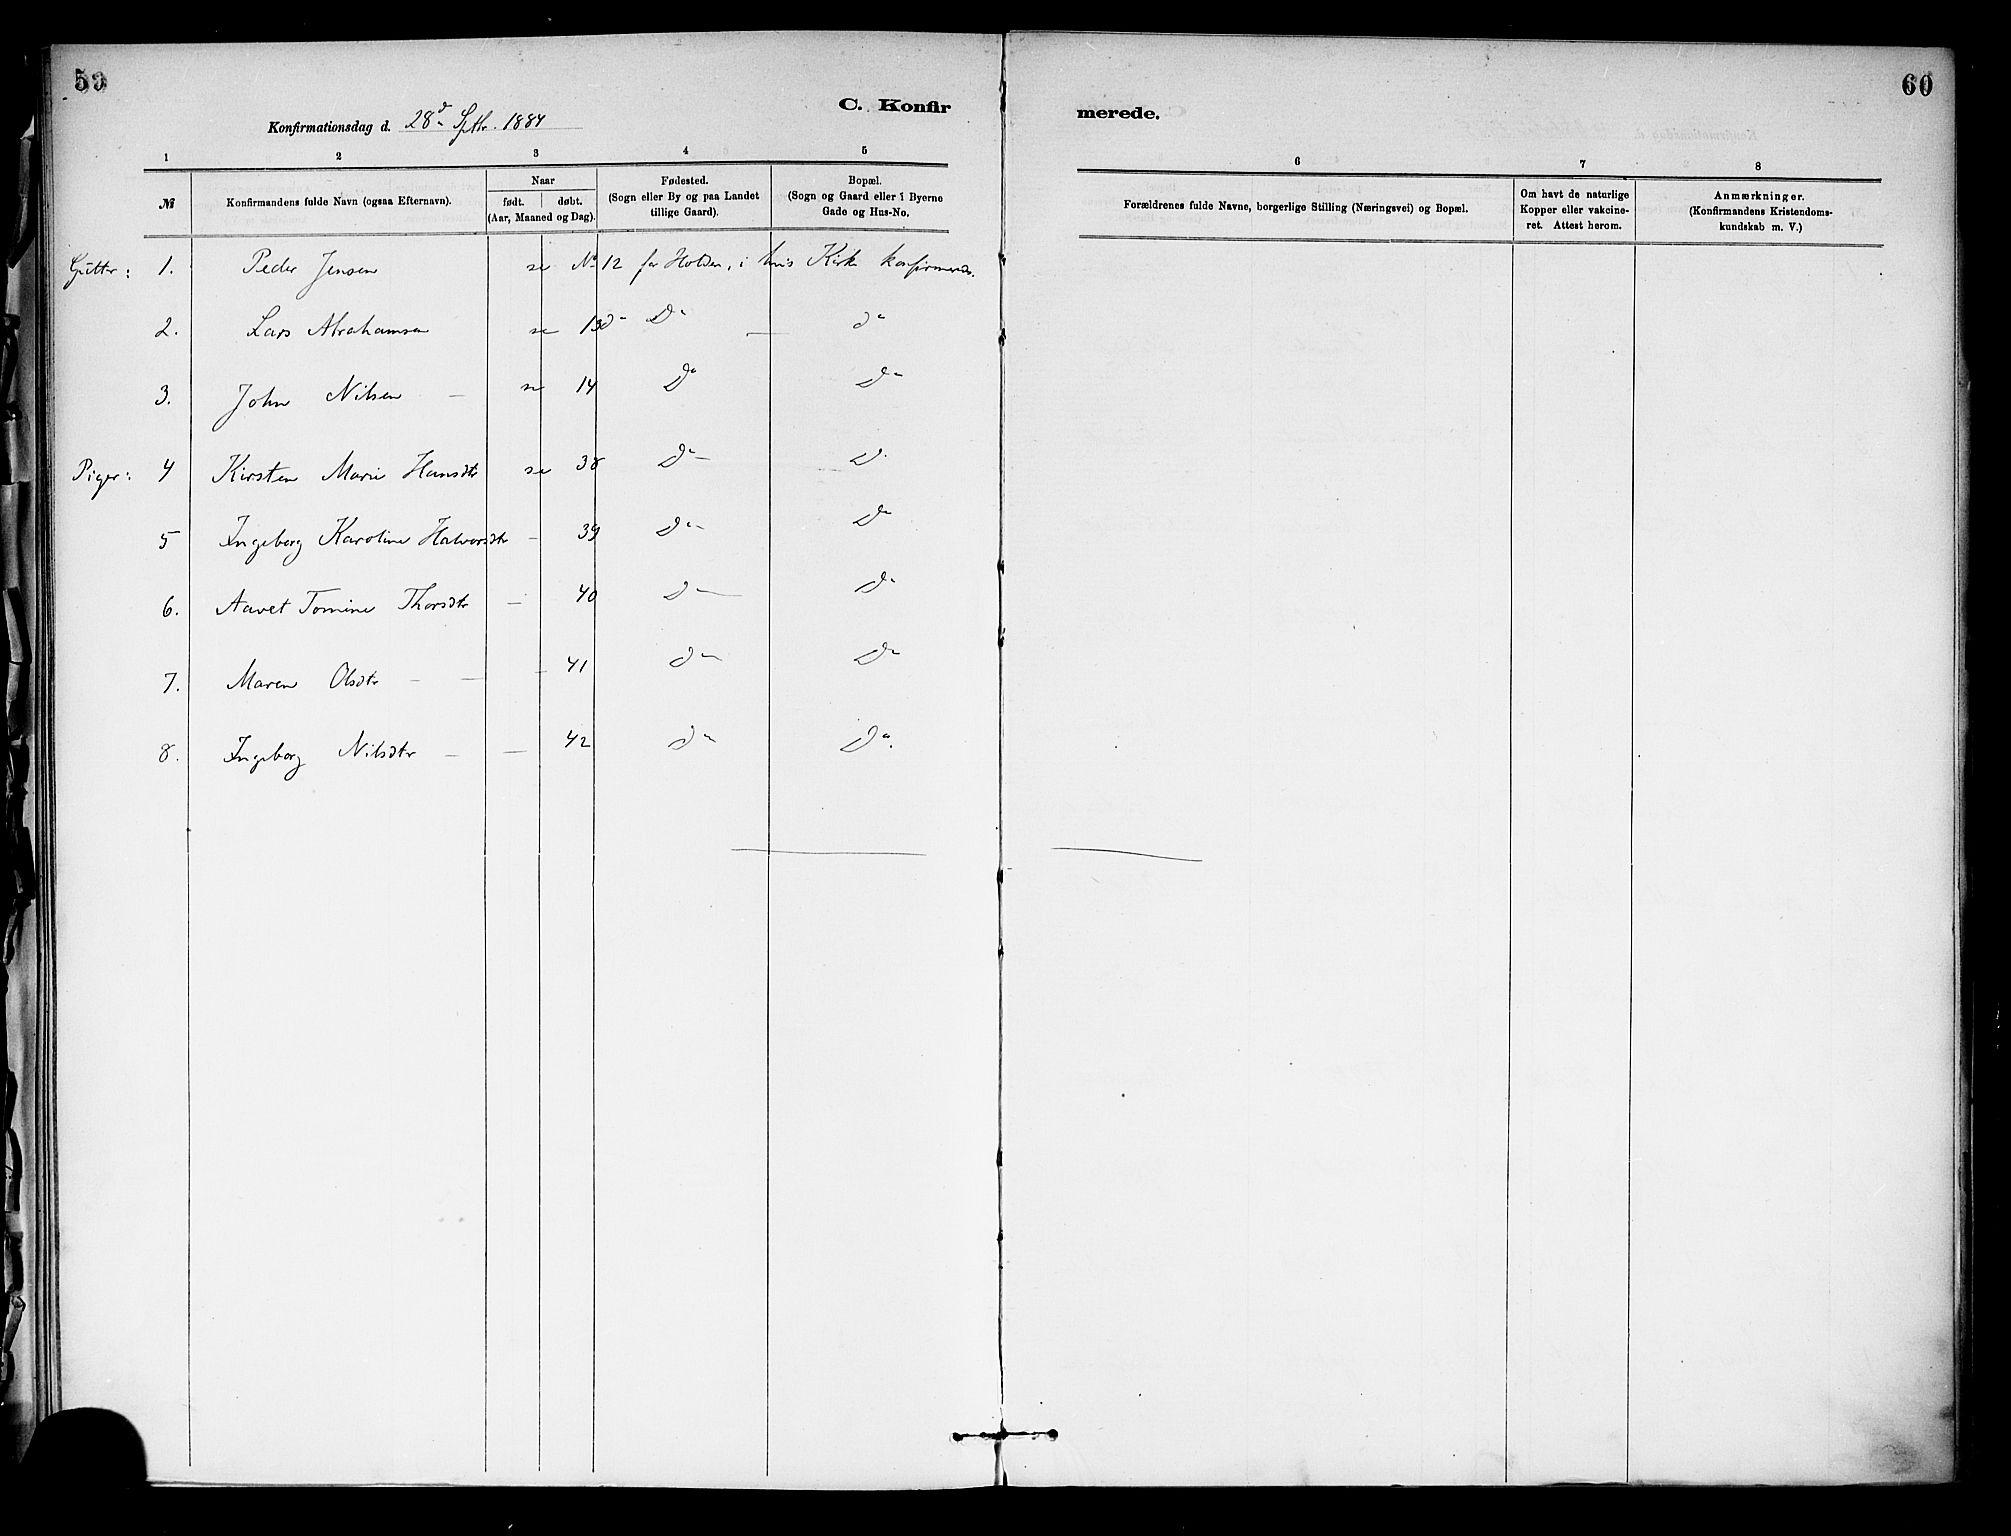 SAKO, Holla kirkebøker, F/Fa/L0009: Ministerialbok nr. 9, 1881-1897, s. 59